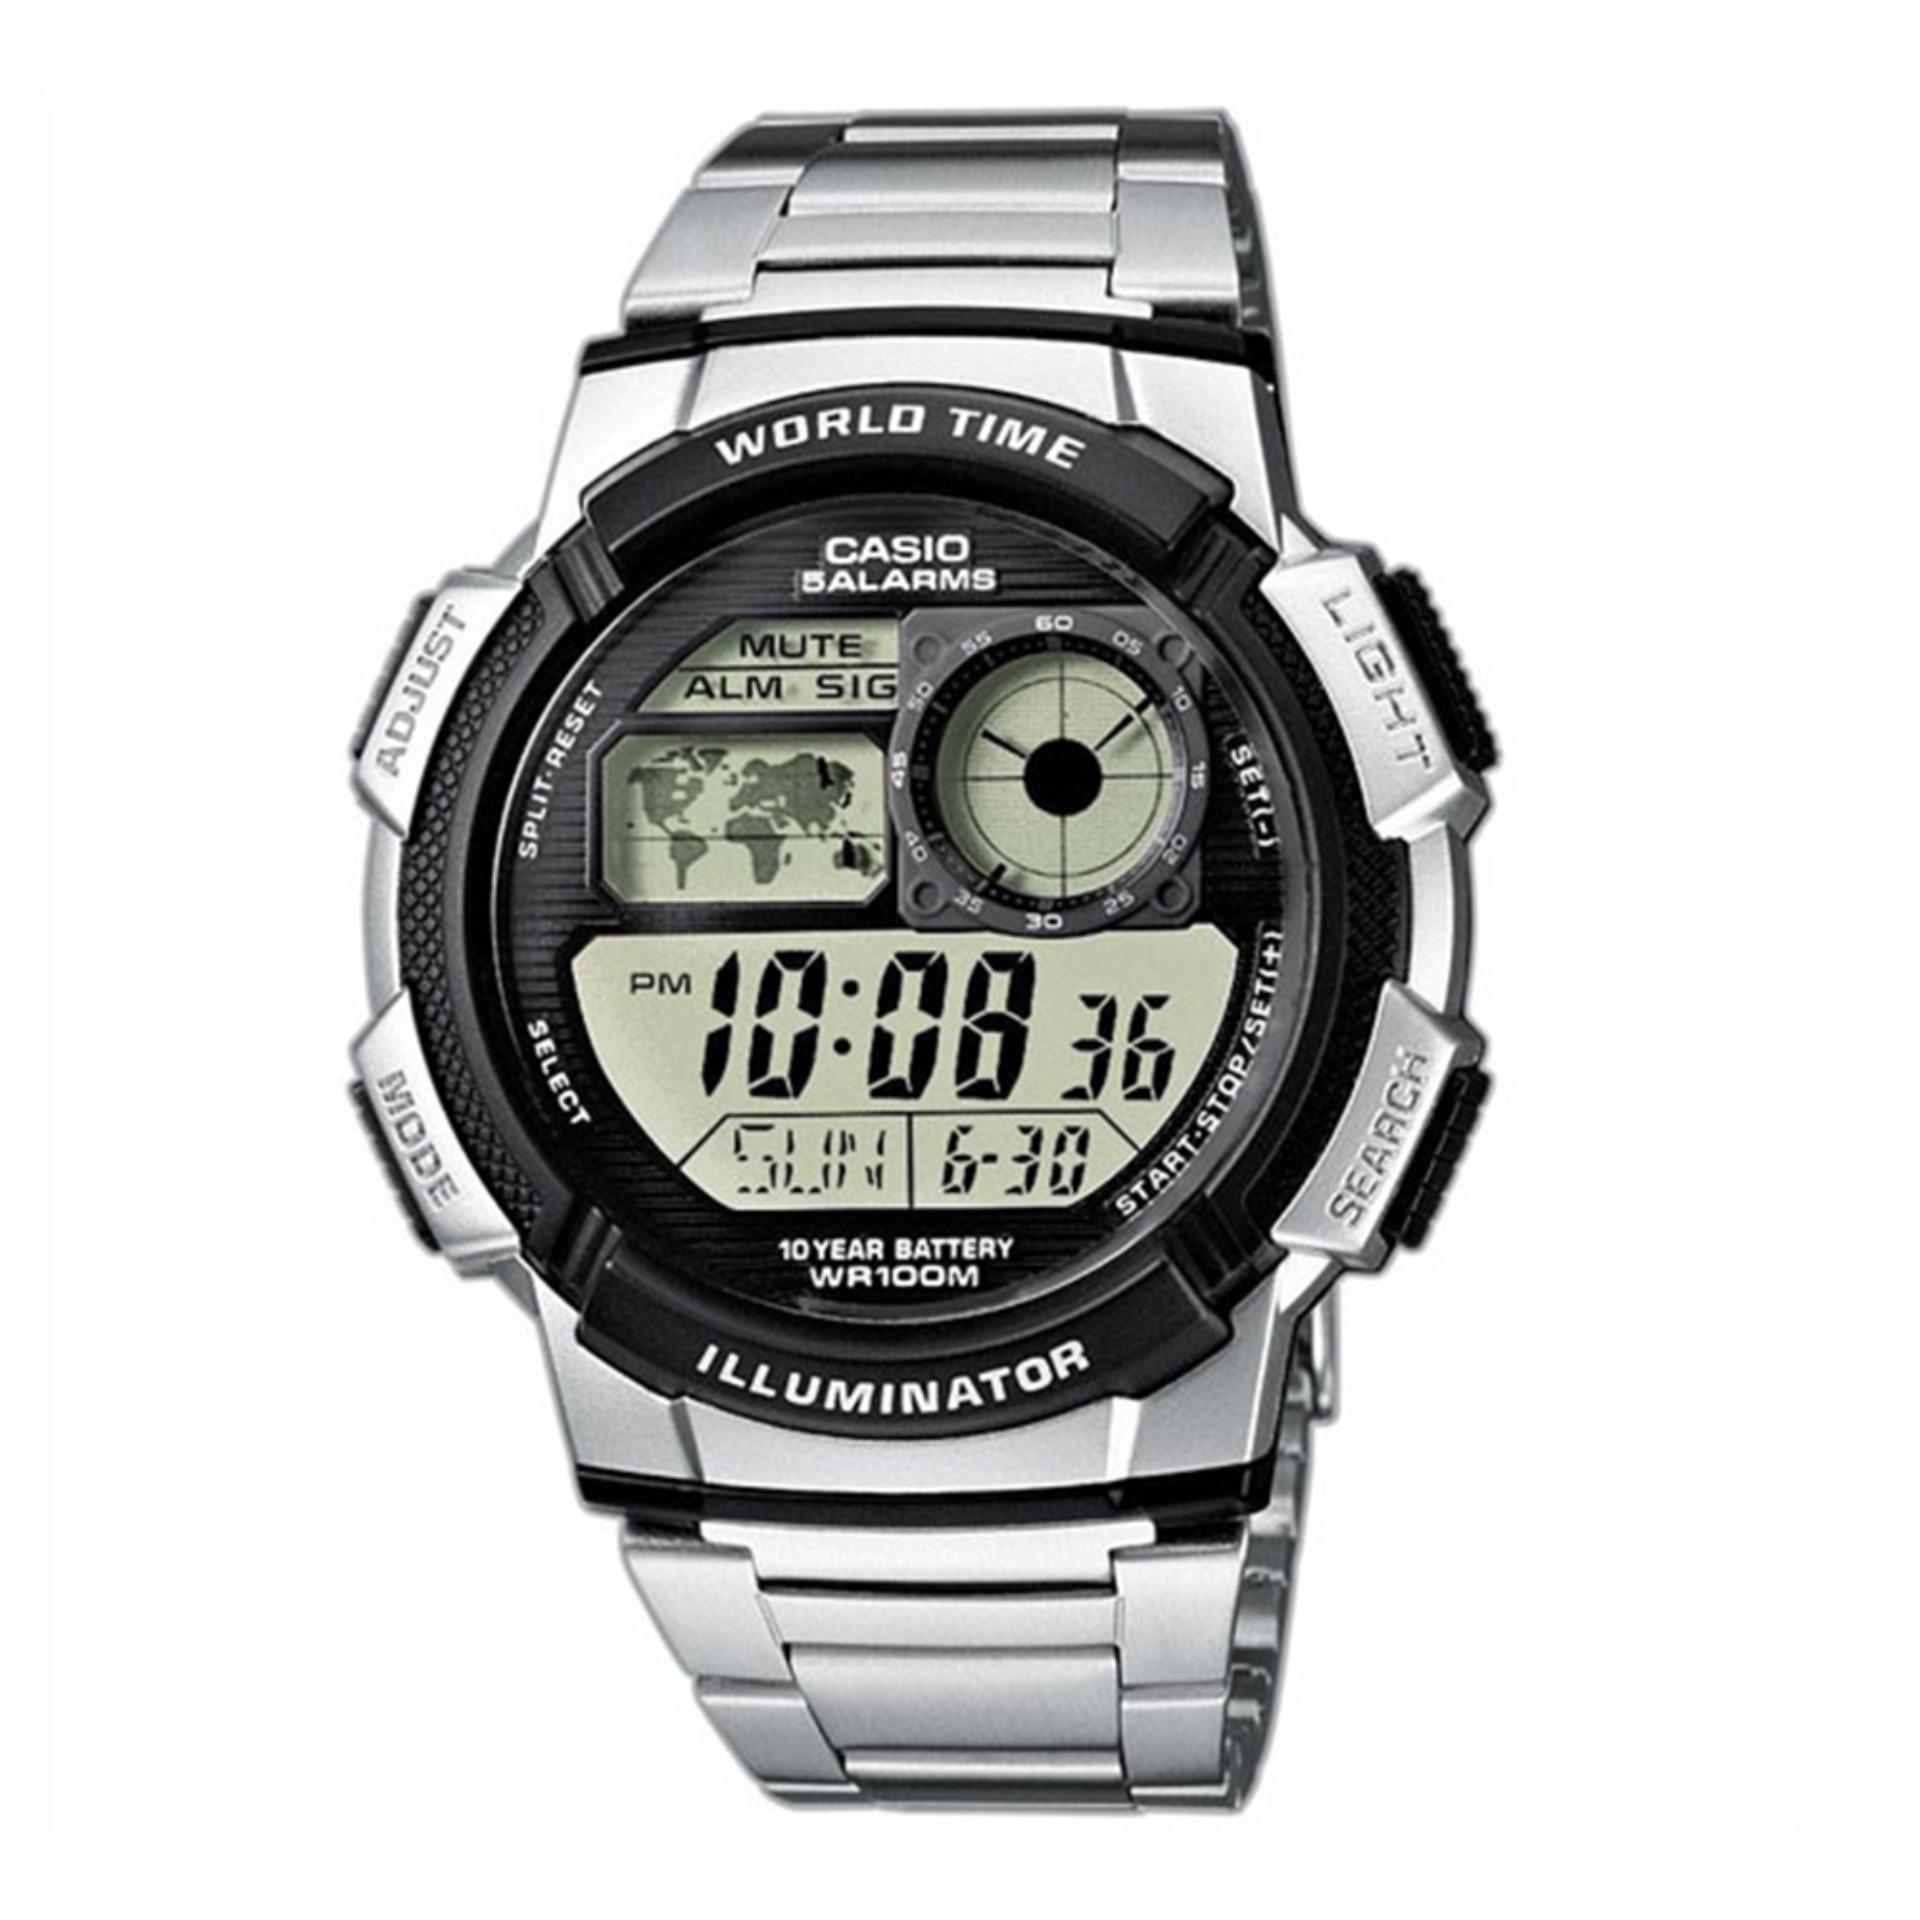 Đồng hồ nam dây kim loại Casio AE-1000WD-1AVDF bán chạy